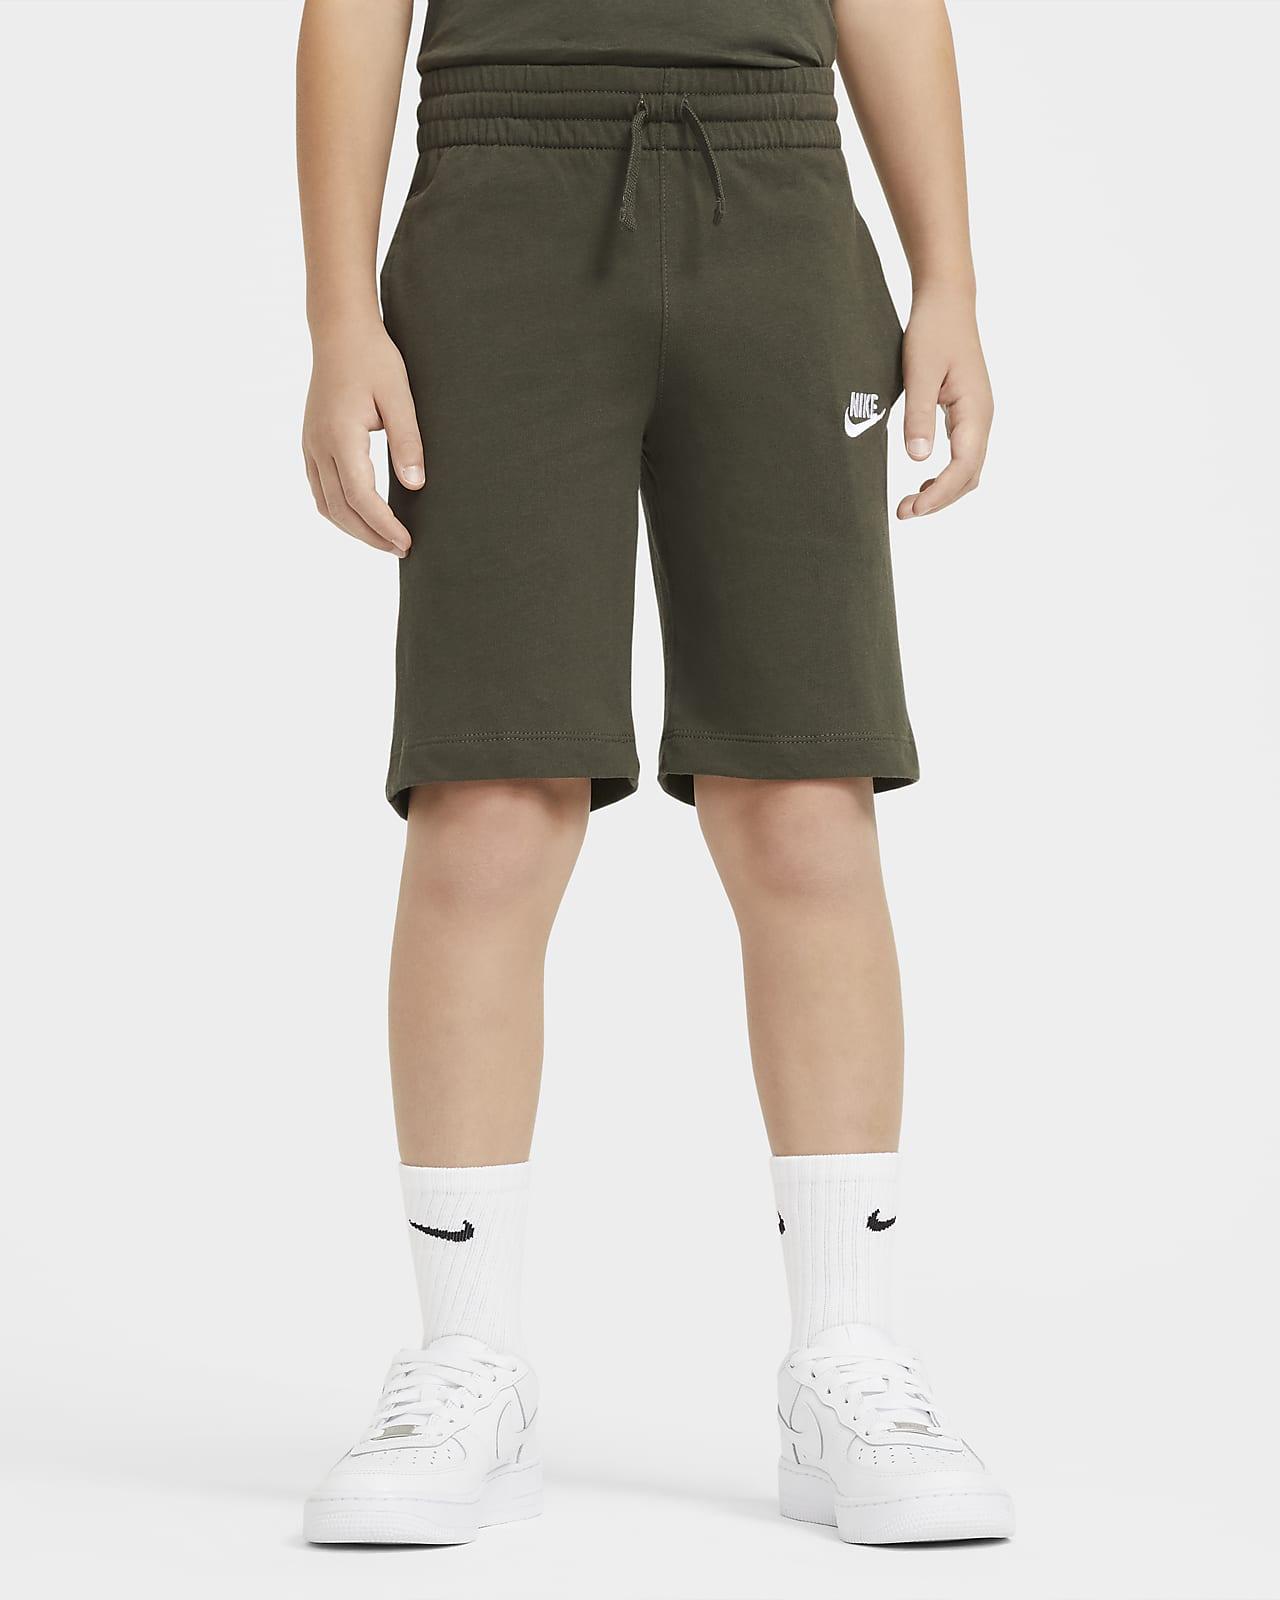 Nike Sportswear Genç Çocuk (Erkek) Şortu